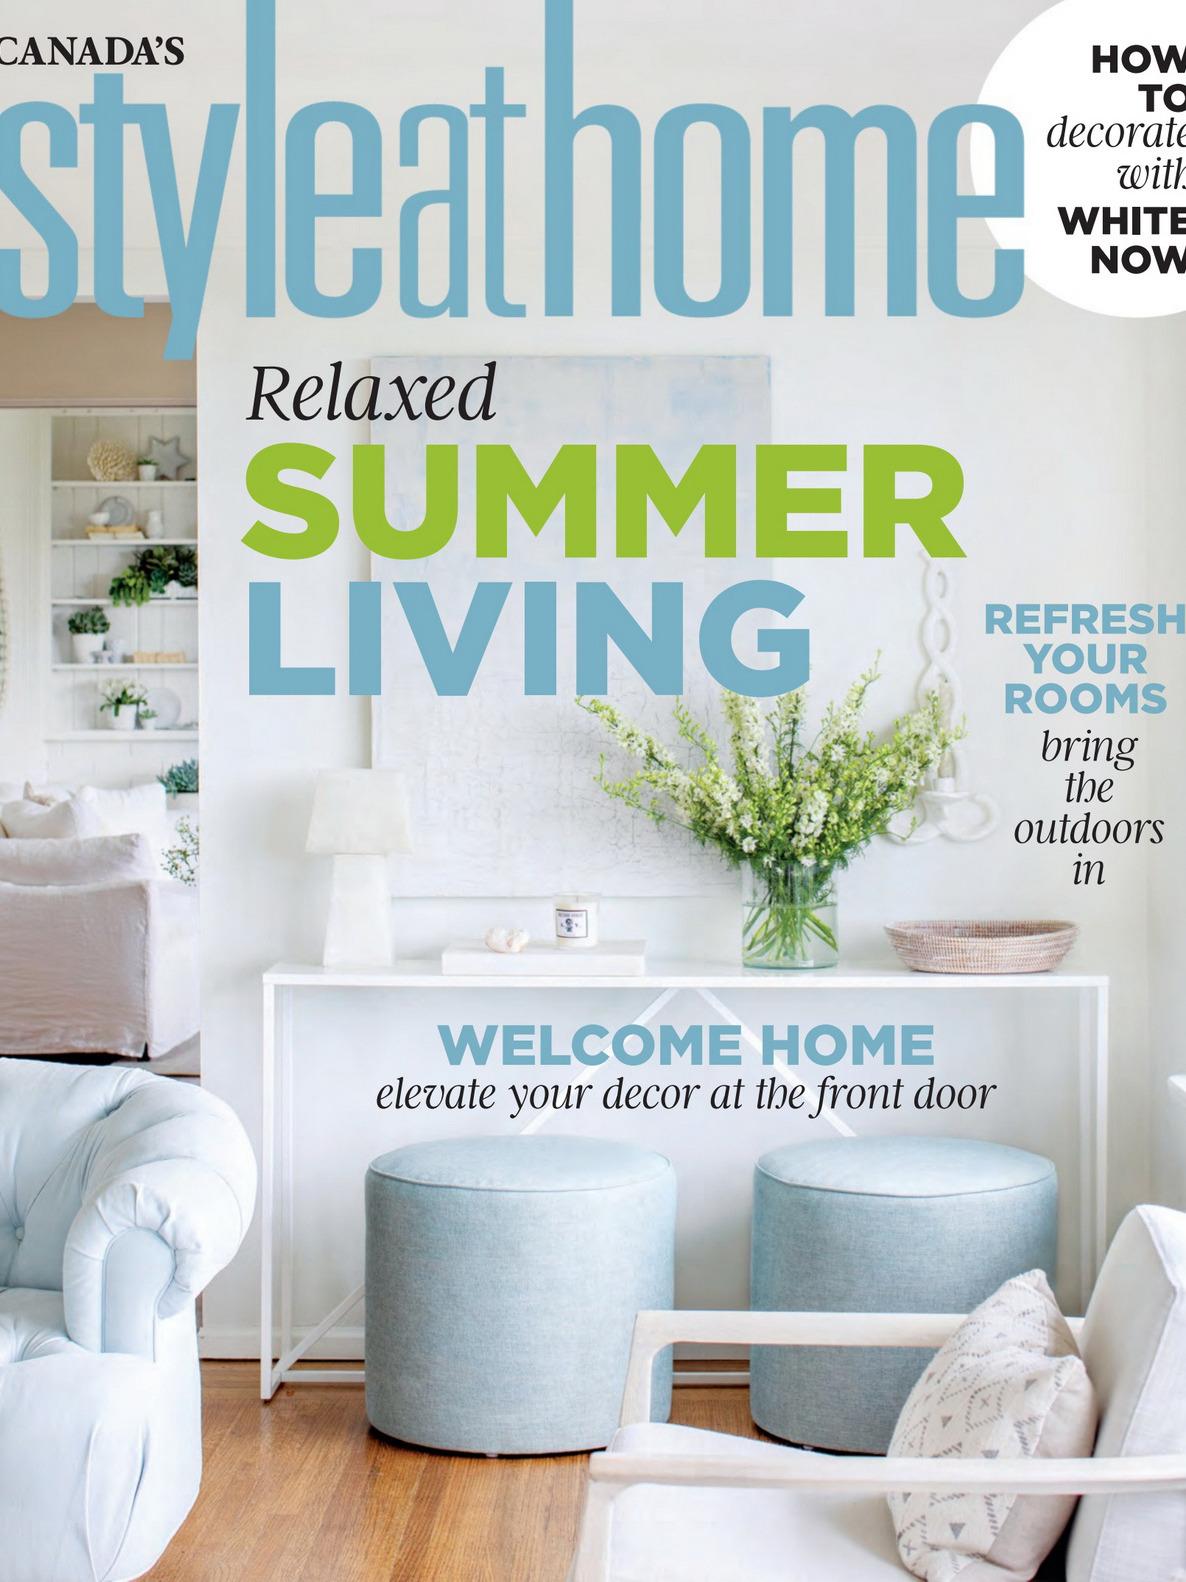 《Style at Home》加拿大版时尚家居杂志2020年07月号